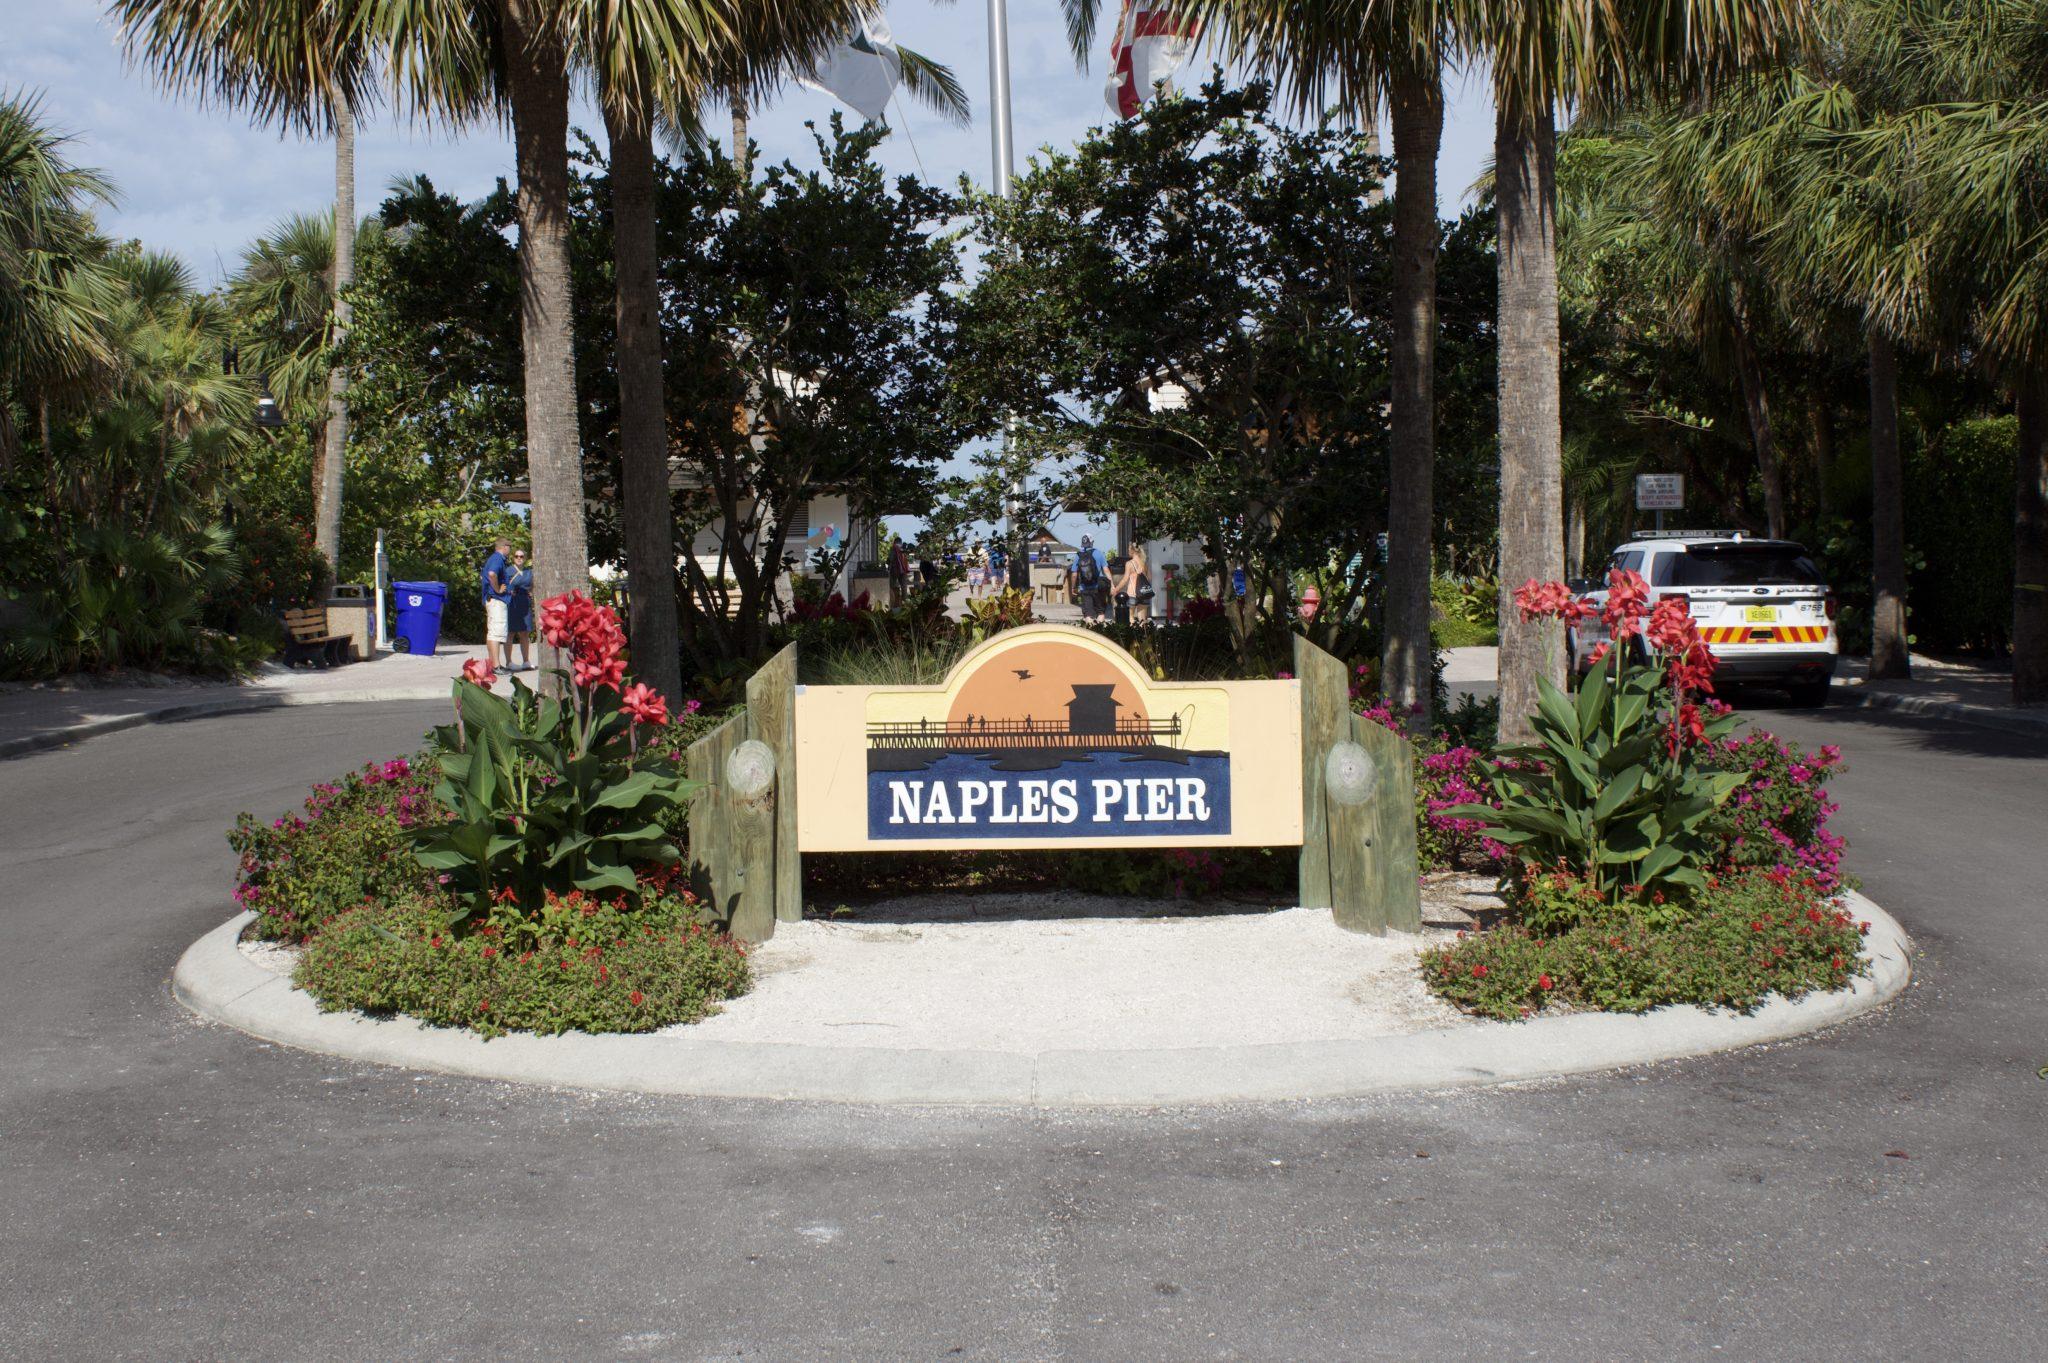 Naples Pier